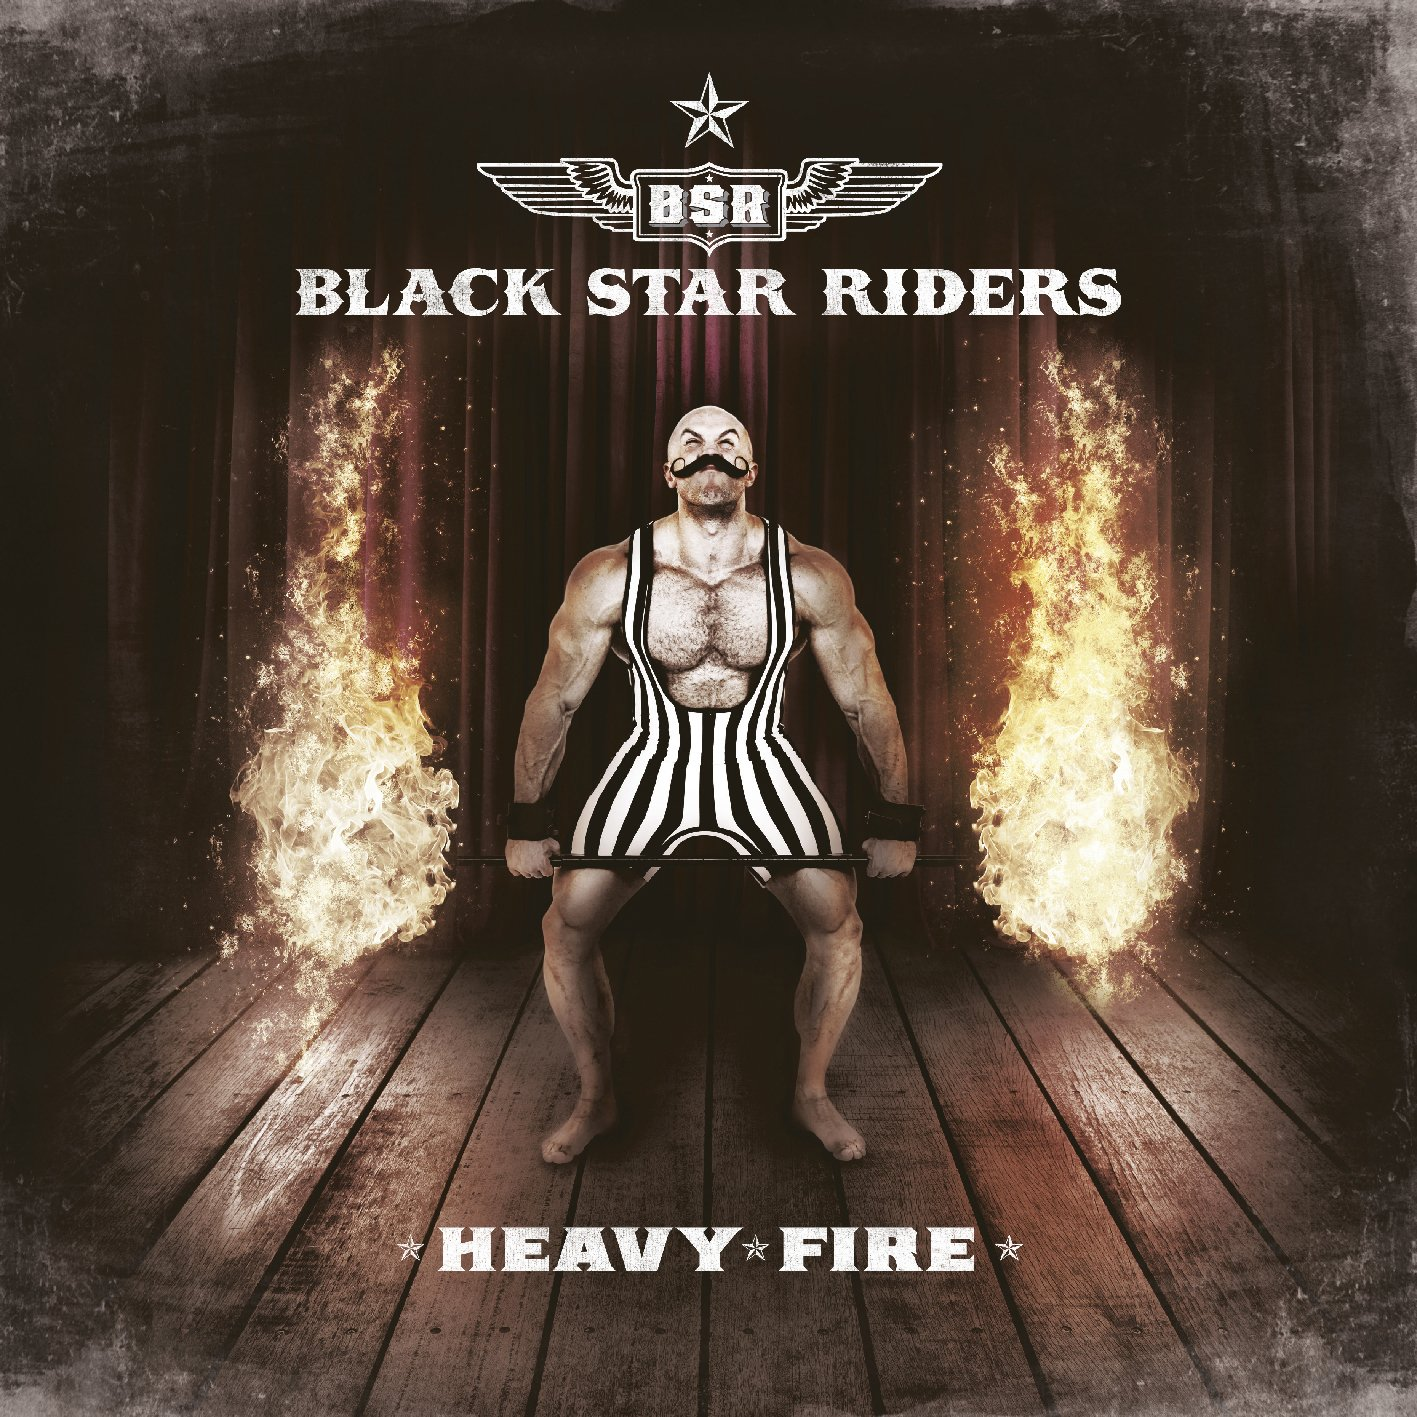 CD : Black Star Riders - Heavy Fire (CD)